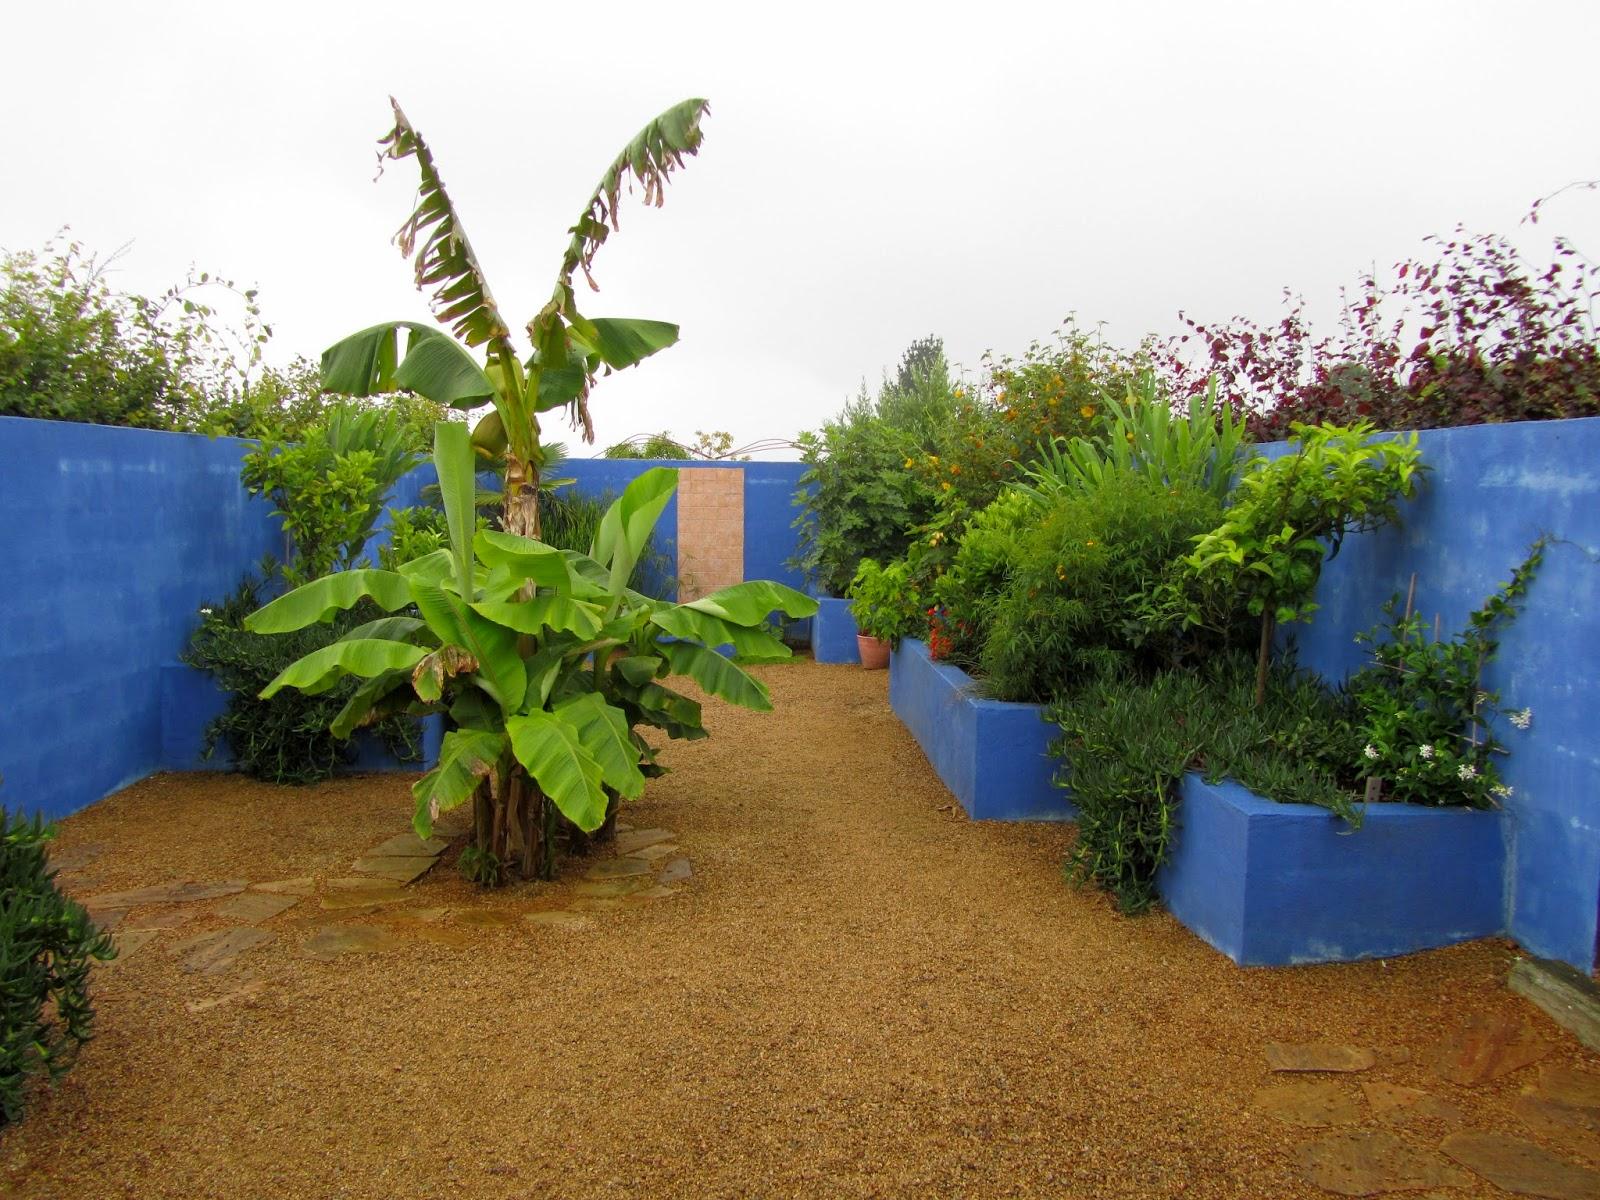 ancolies compagnie visite des jardins de kerfouler. Black Bedroom Furniture Sets. Home Design Ideas